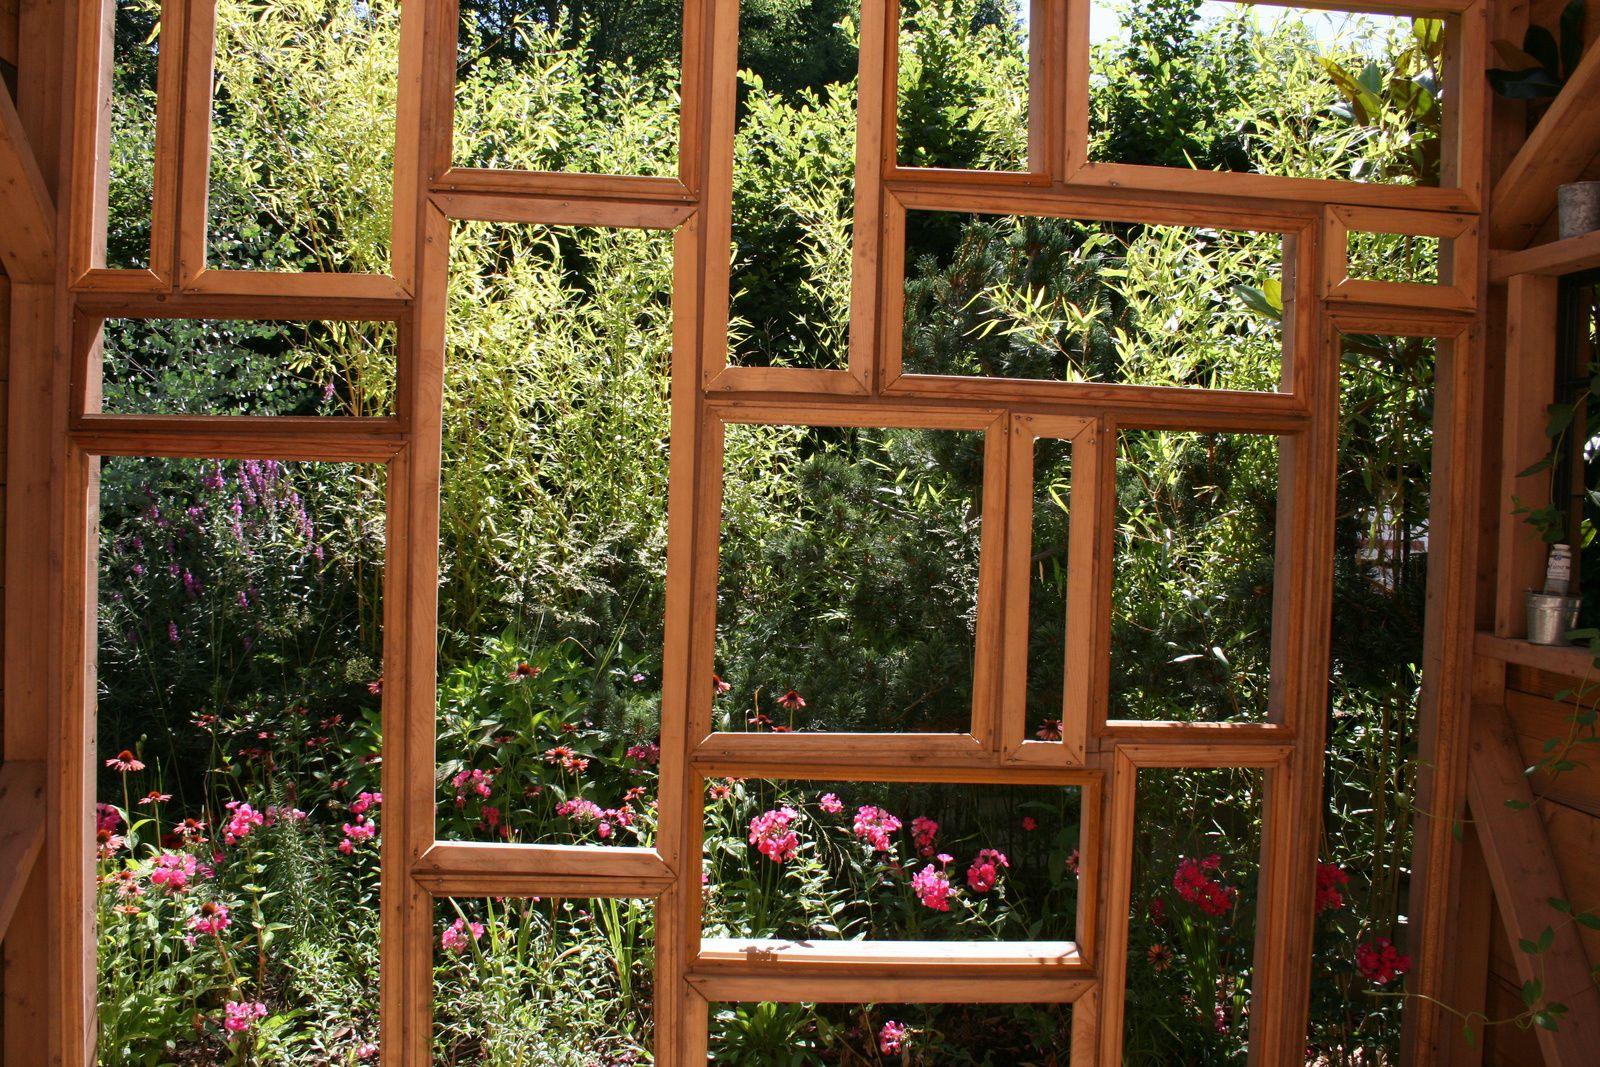 #cadre #jardins #exposition #chaumontsurloire #charlotteblabla blog